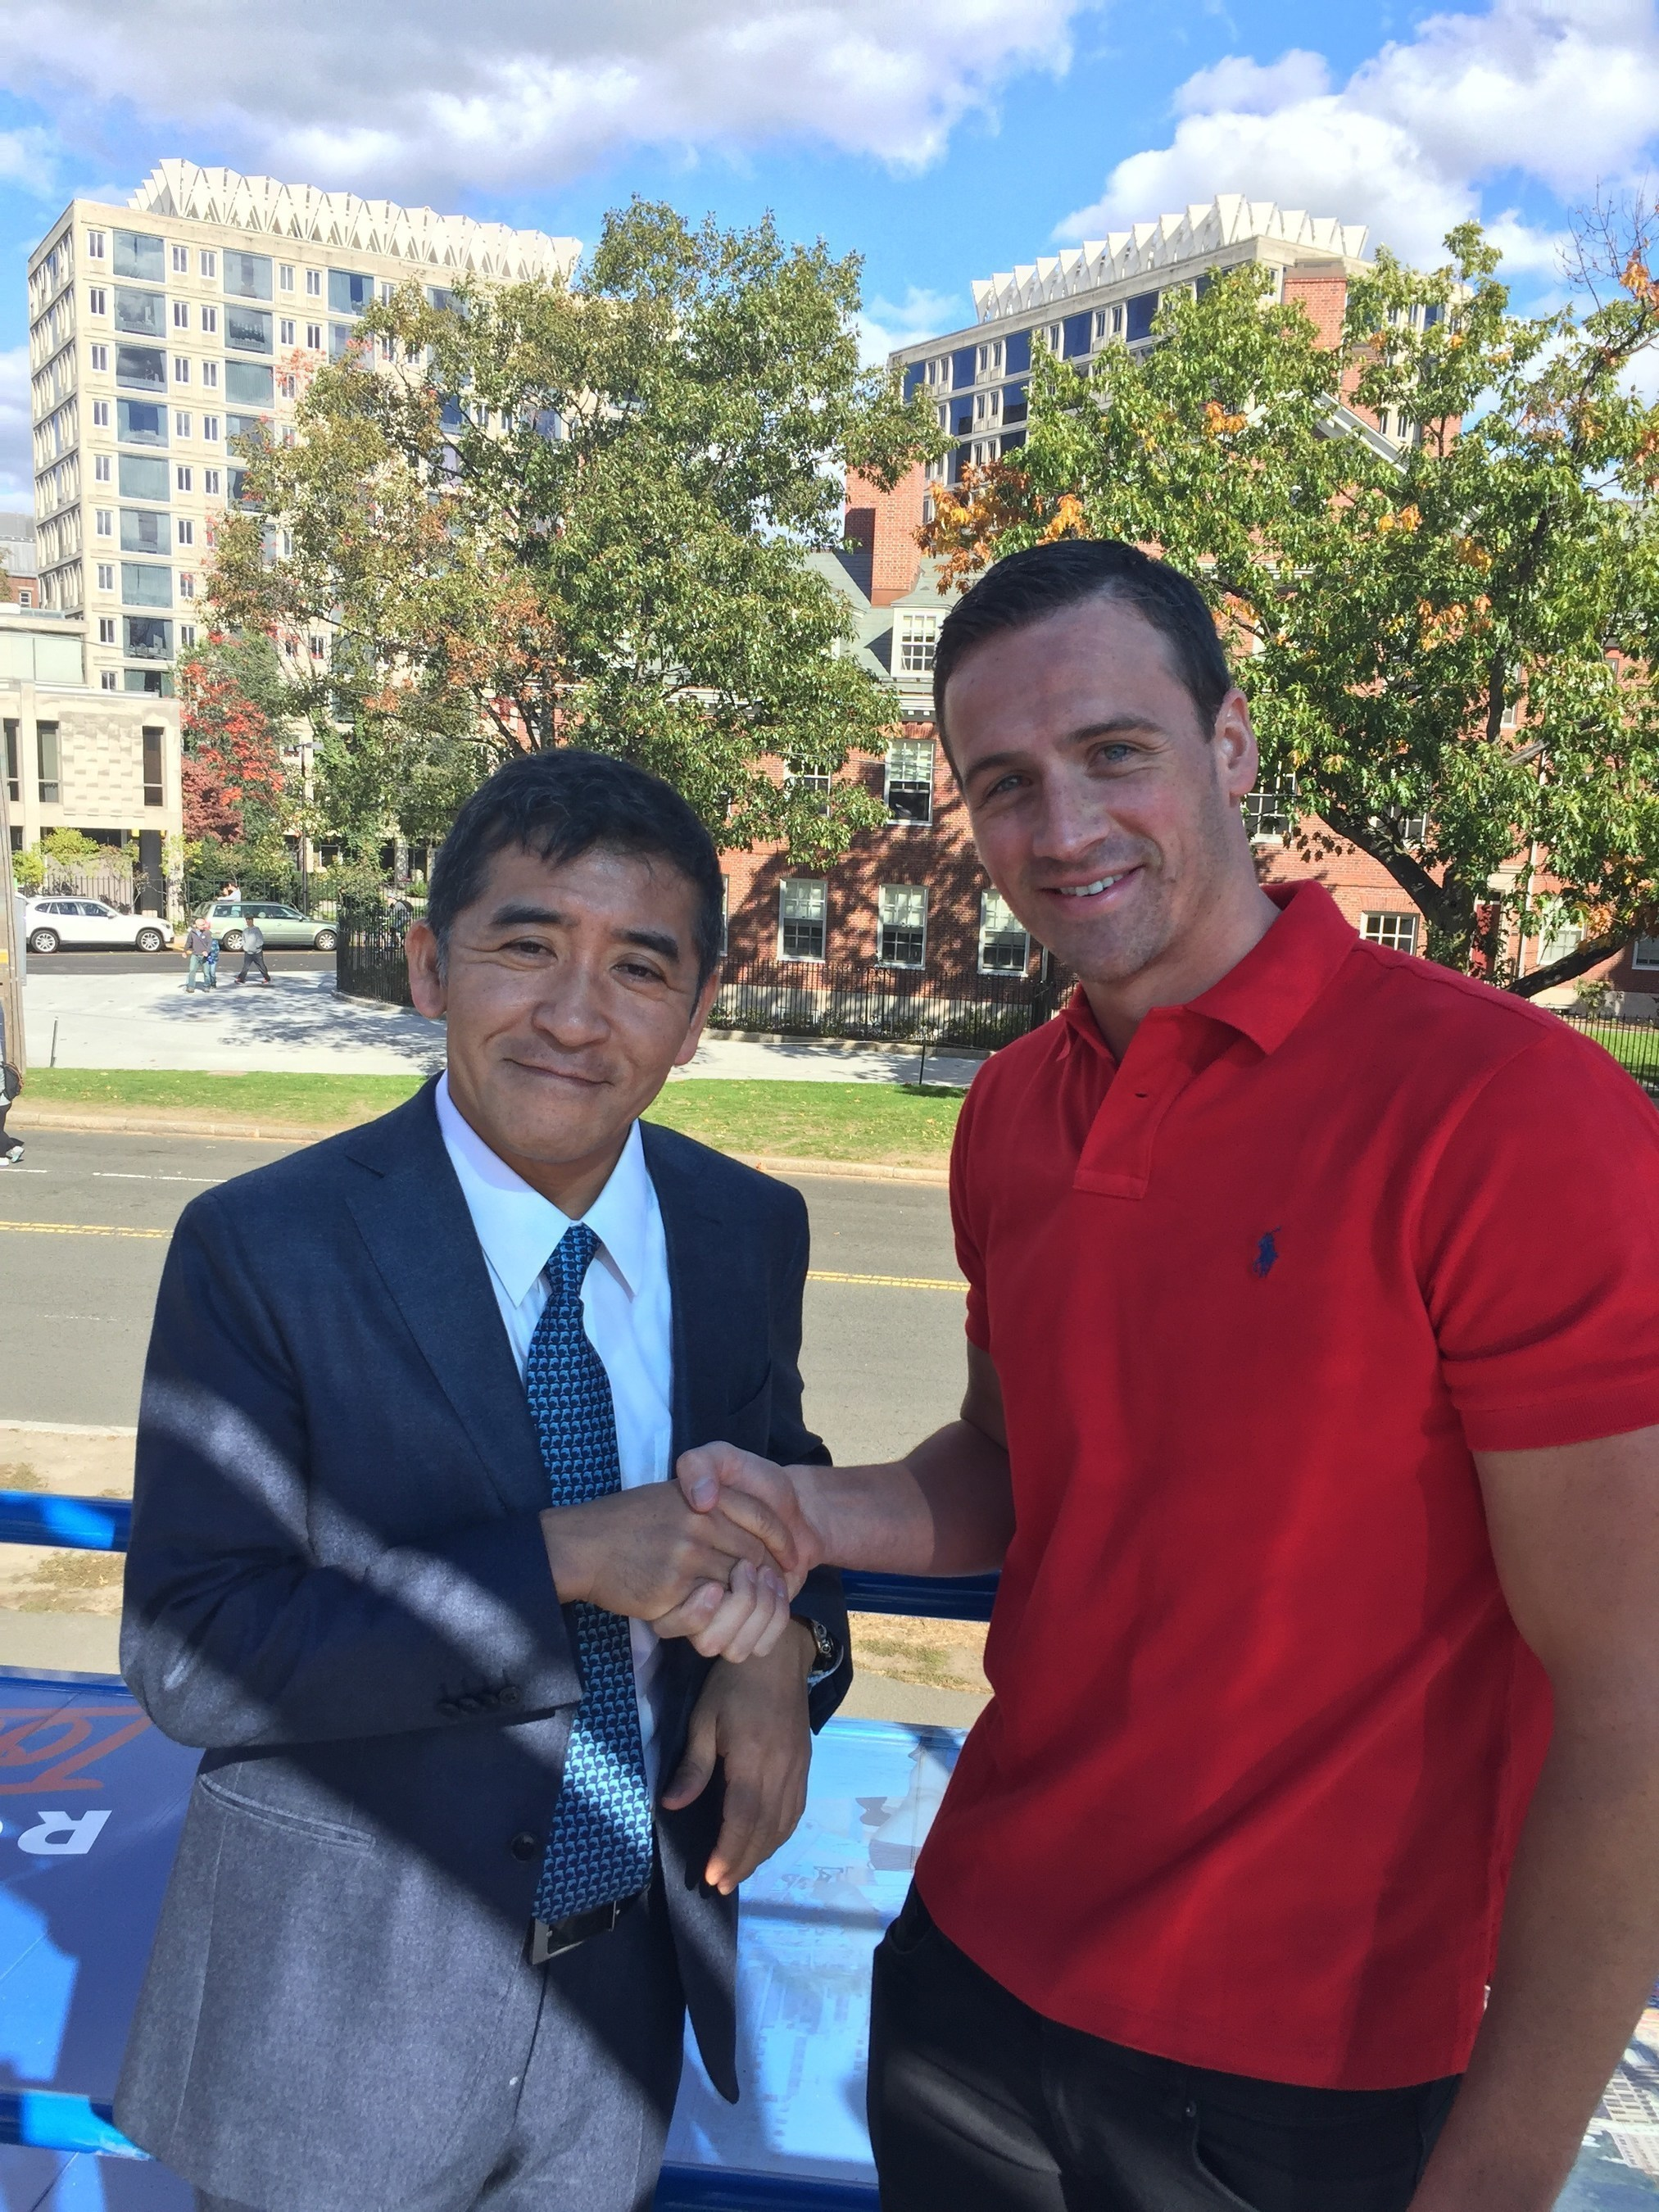 Ryan Lochte and airweave CEO, Motokuni Takaoka